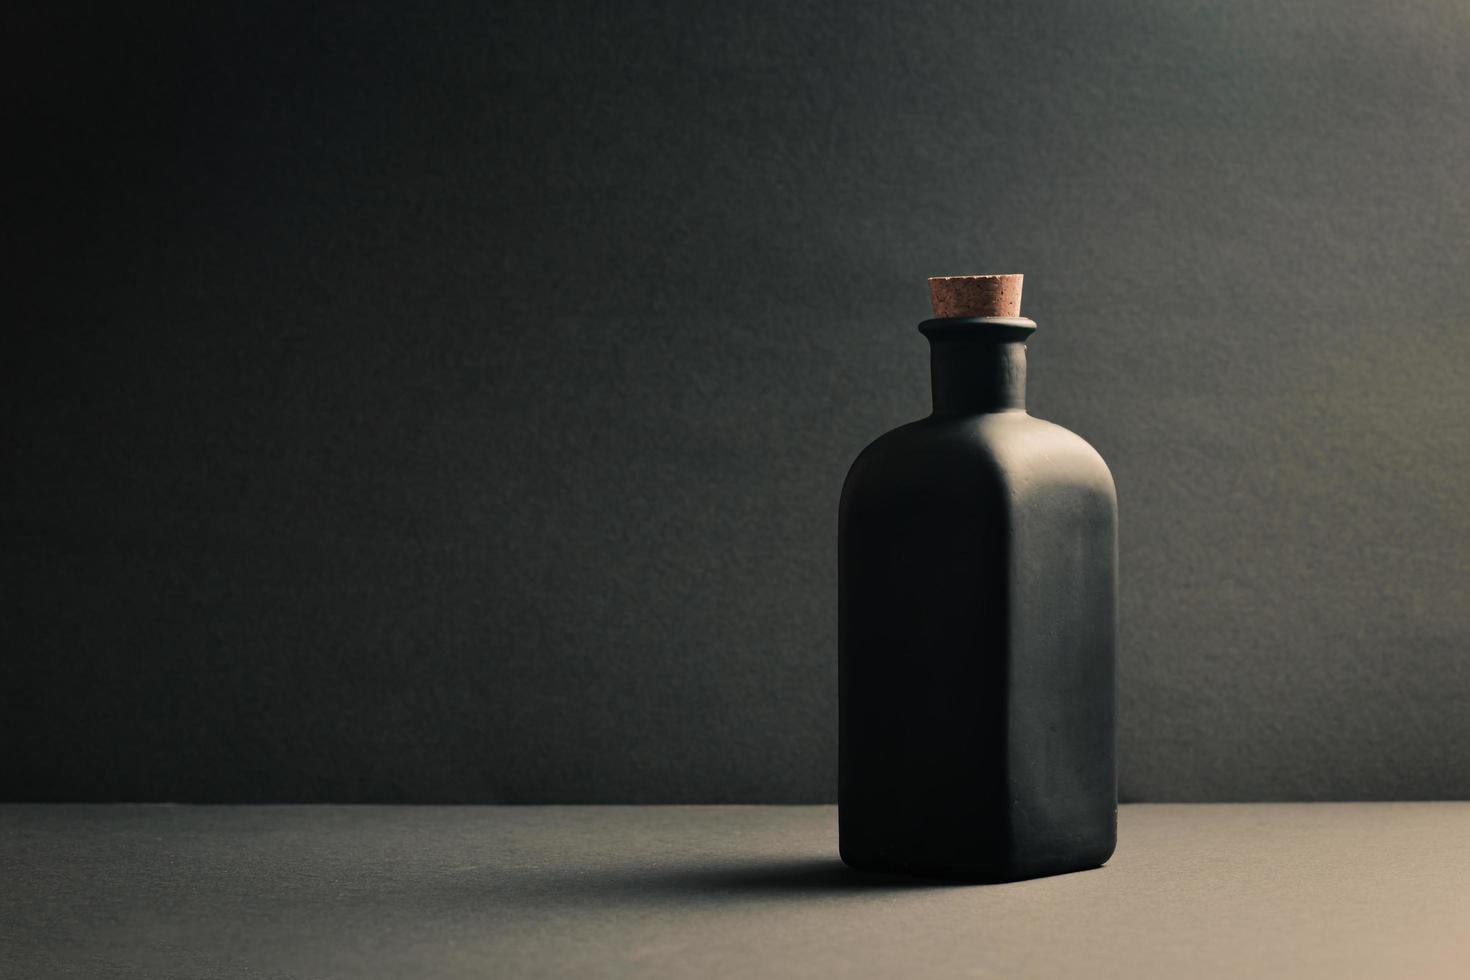 botella de cerámica negra única foto